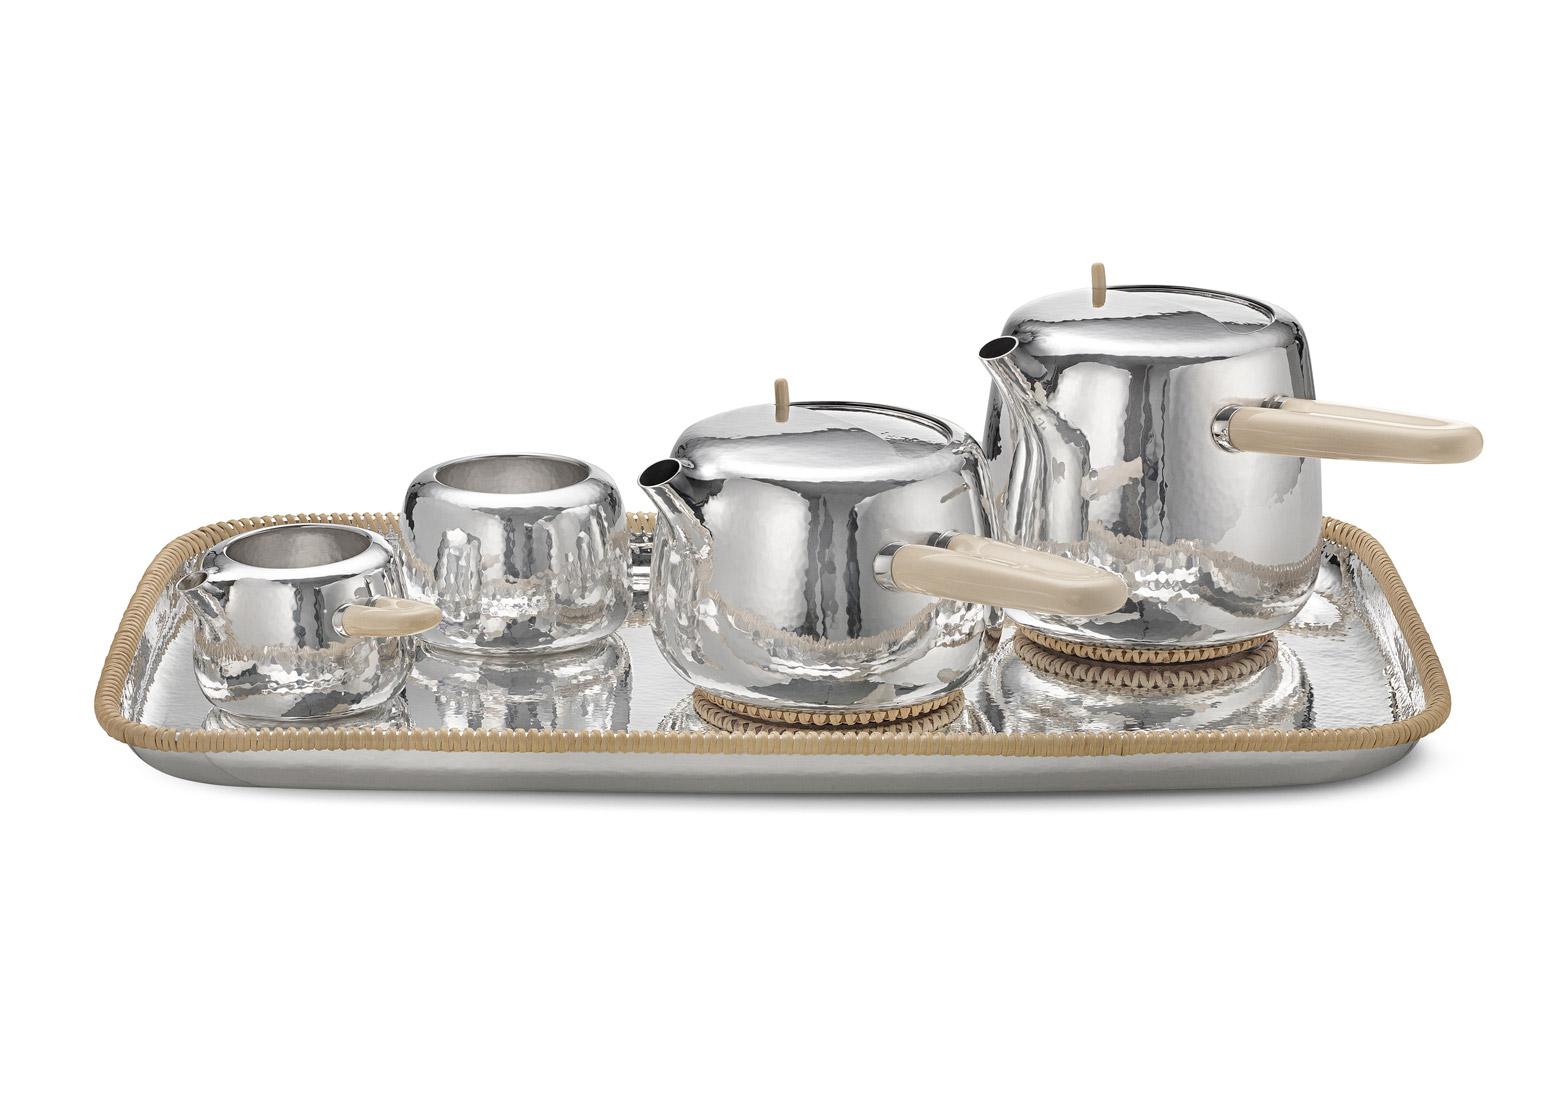 Marc-Newson-tea-set_Georg-Jensen_dezeen_1568_0